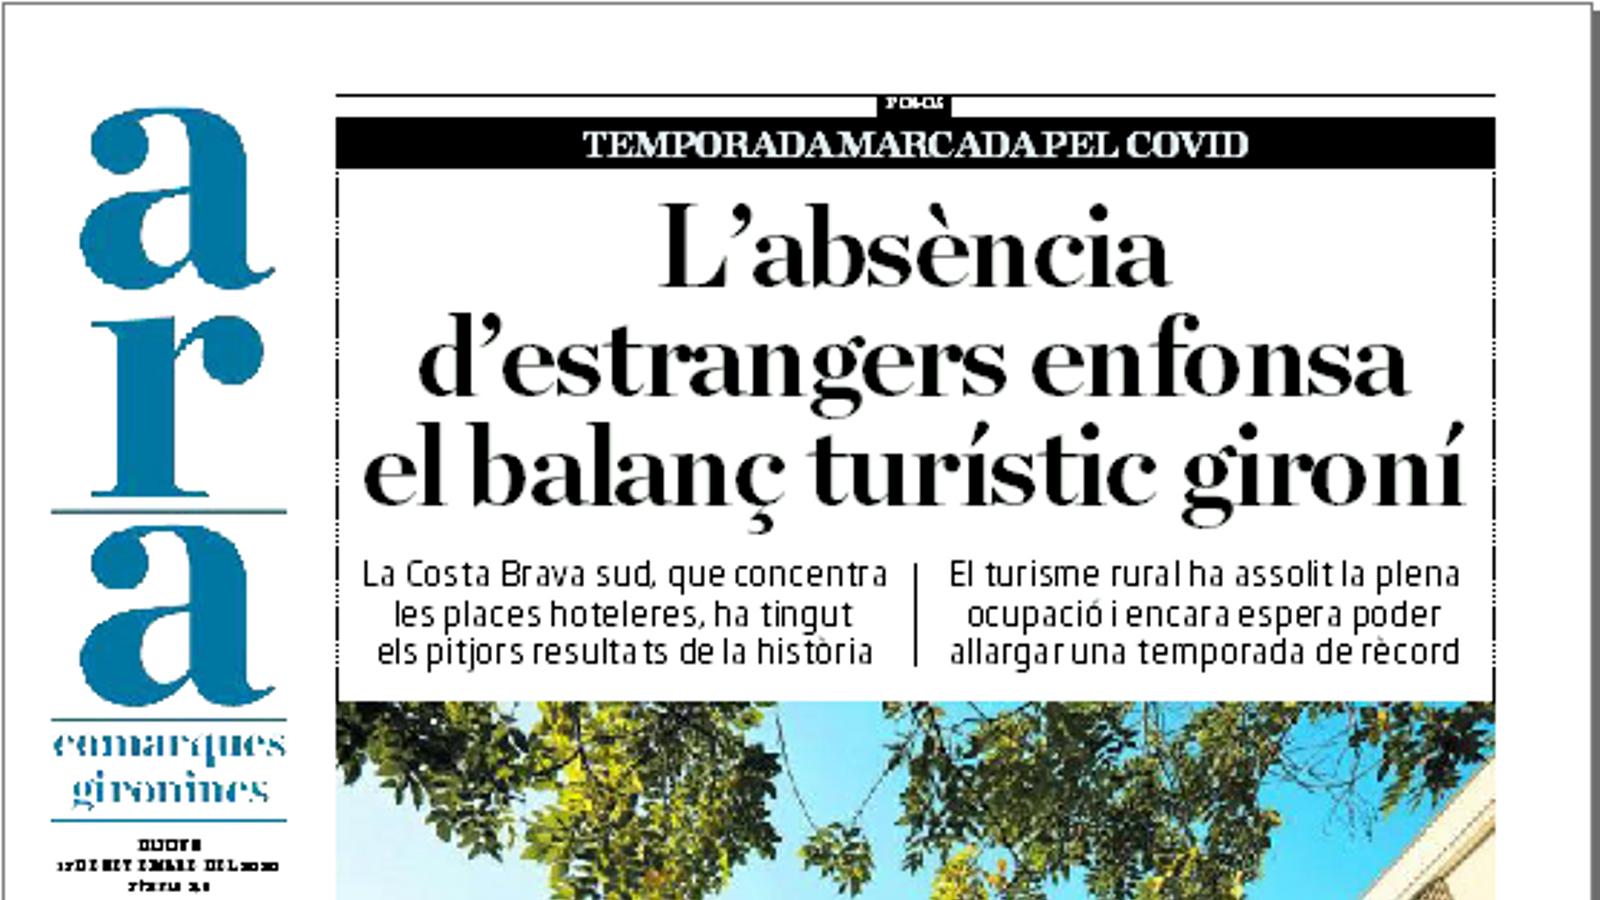 'ARA comarques gironines': L'absència d'estrangers enfonsa el balanç turístic gironí